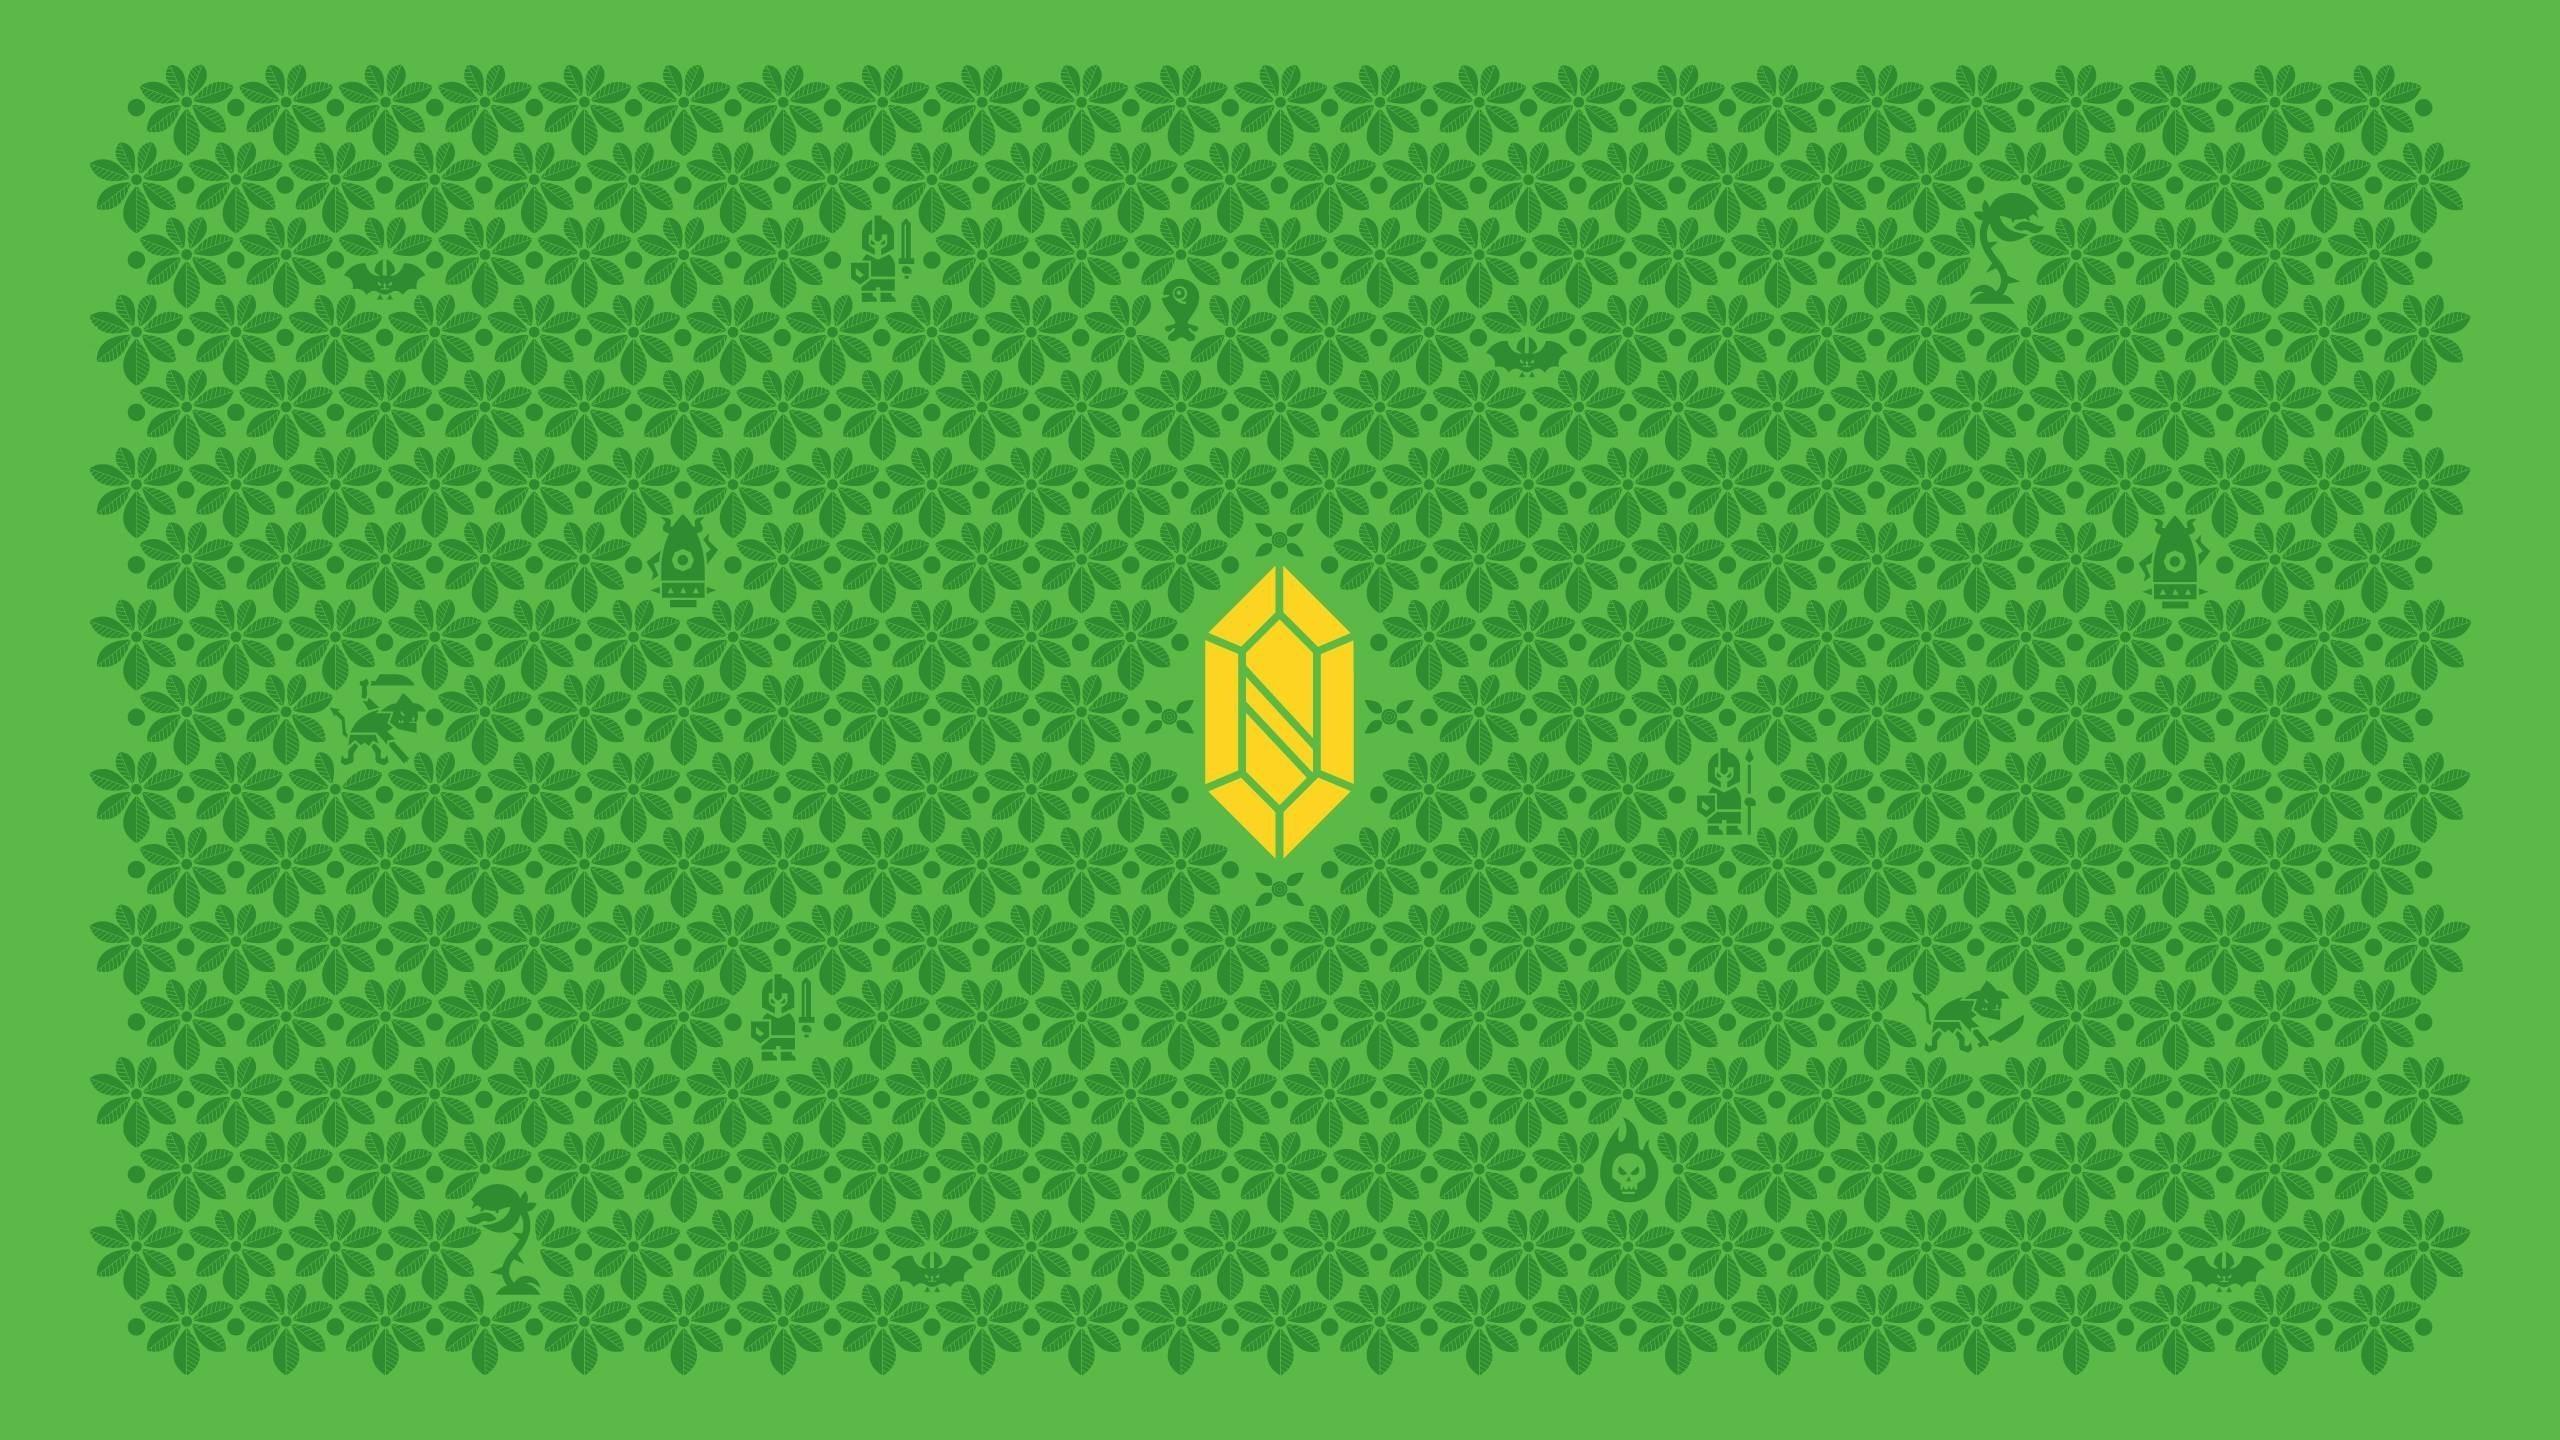 Triforce <b>Wallpaper</b> HD – WallpaperSafari